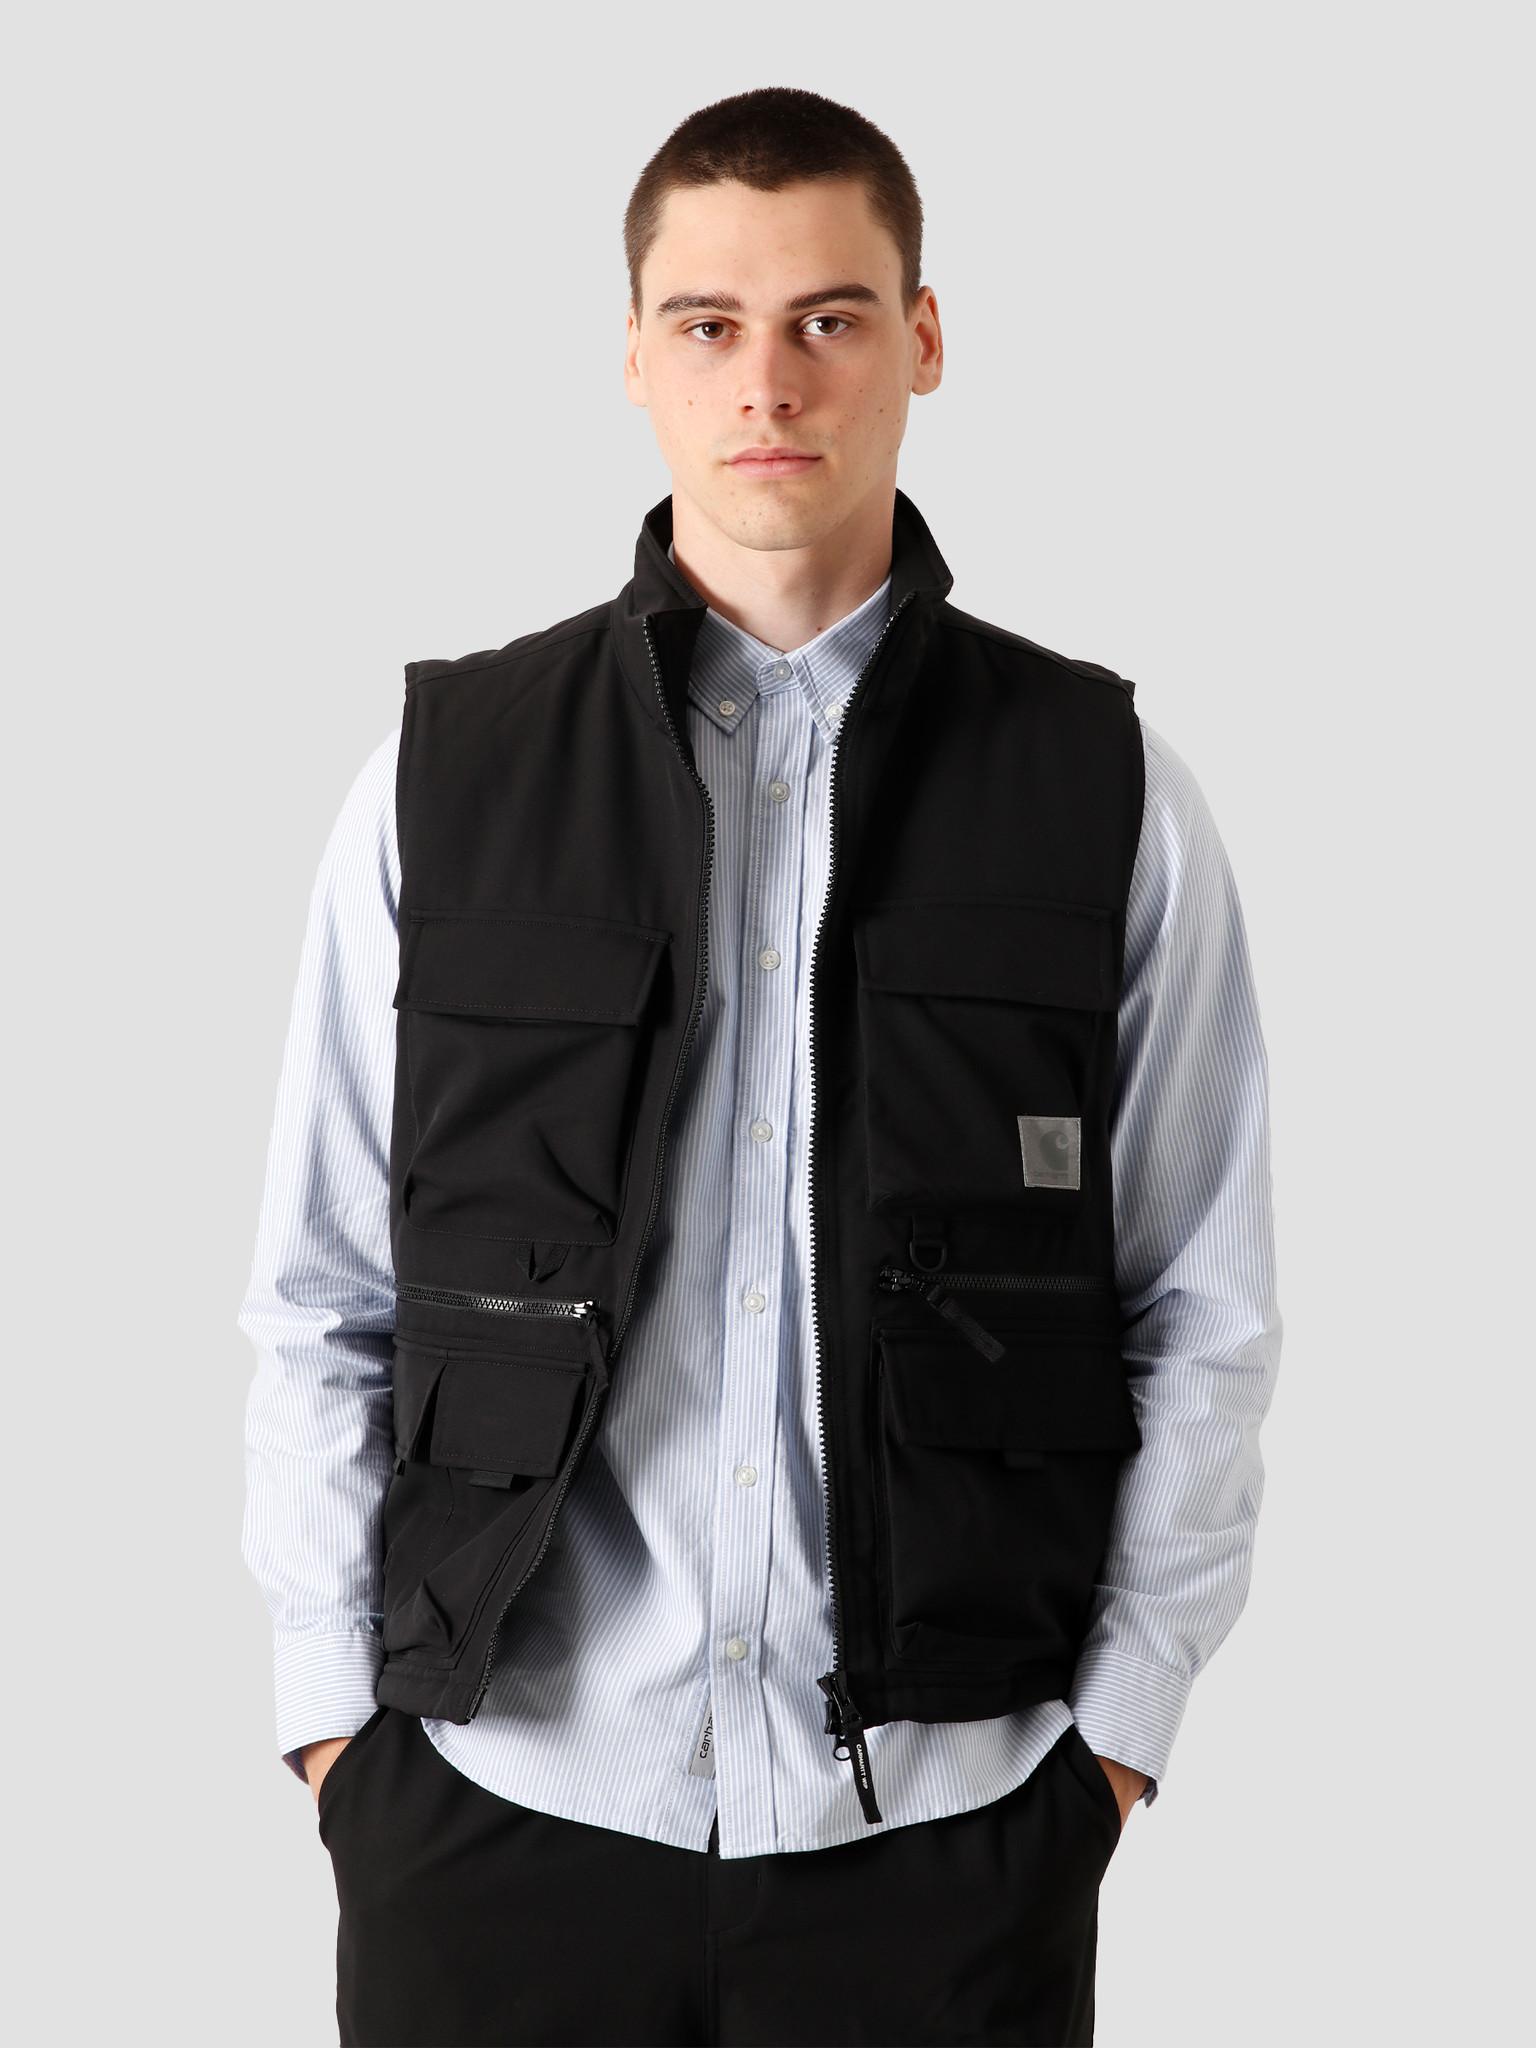 Carhartt WIP Carhartt WIP Colewood Vest Black I028382-8900